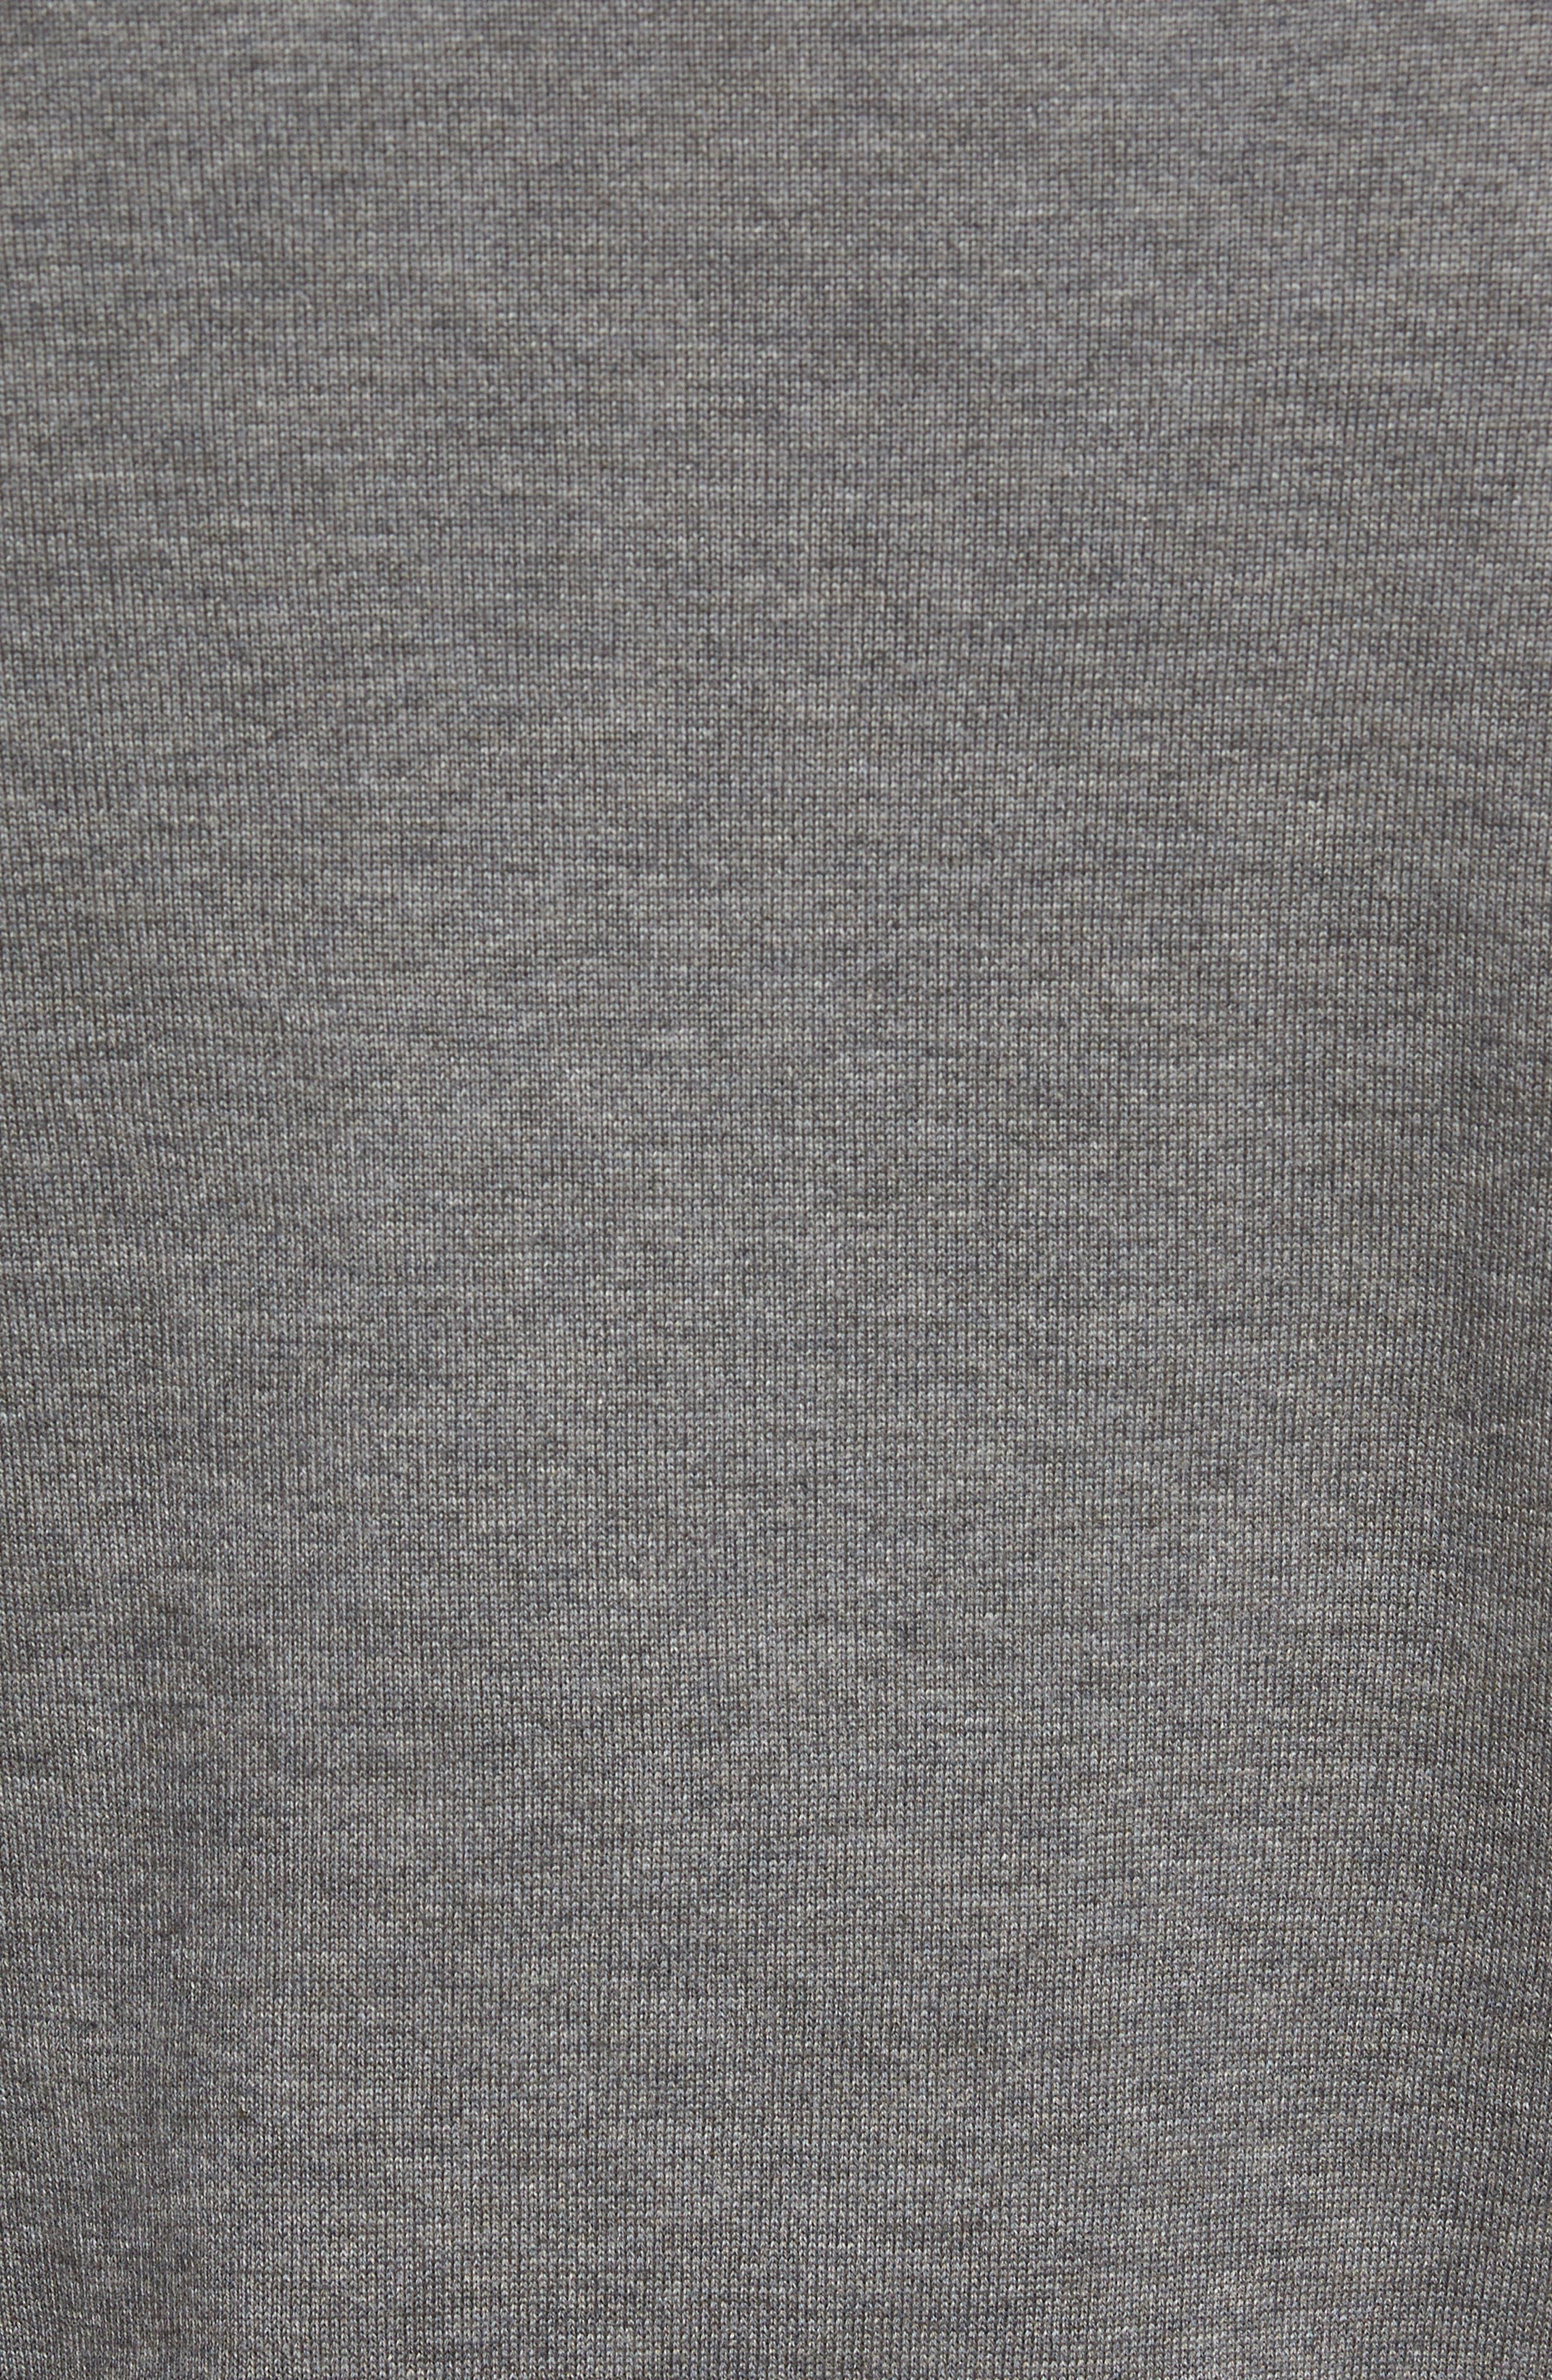 Jersey Knit Crewneck Sweater,                             Alternate thumbnail 5, color,                             032